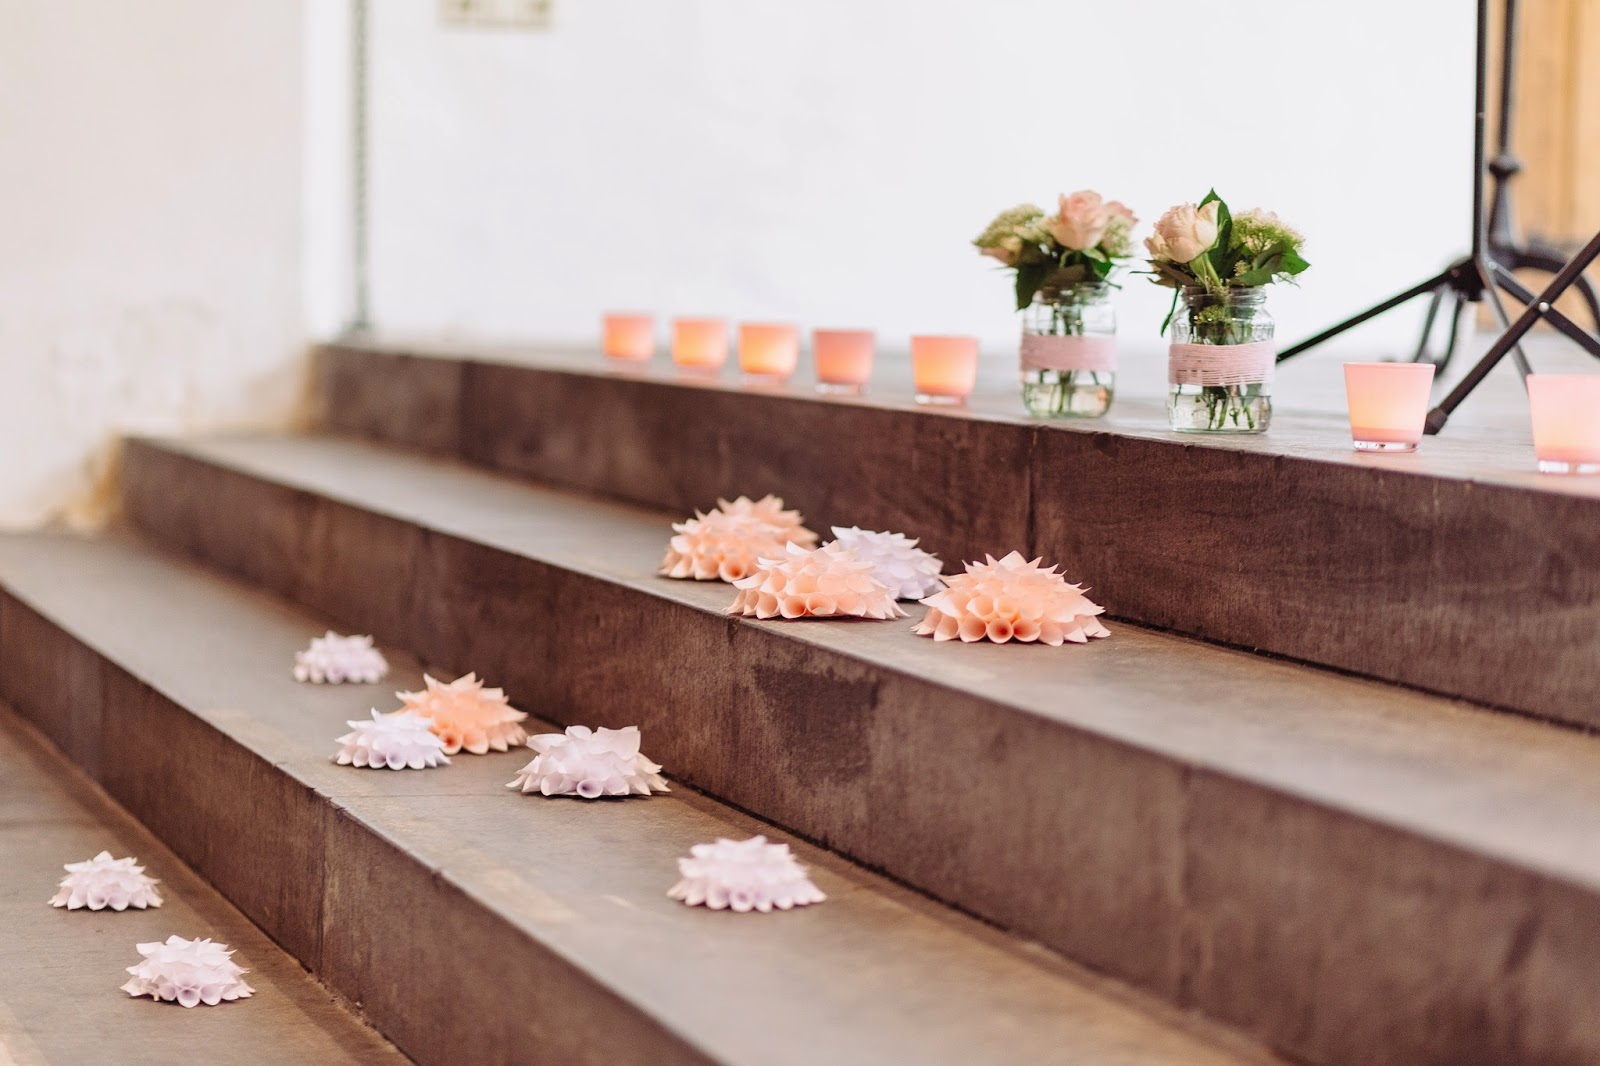 ☆studio bibi u bruiloft decoratie u